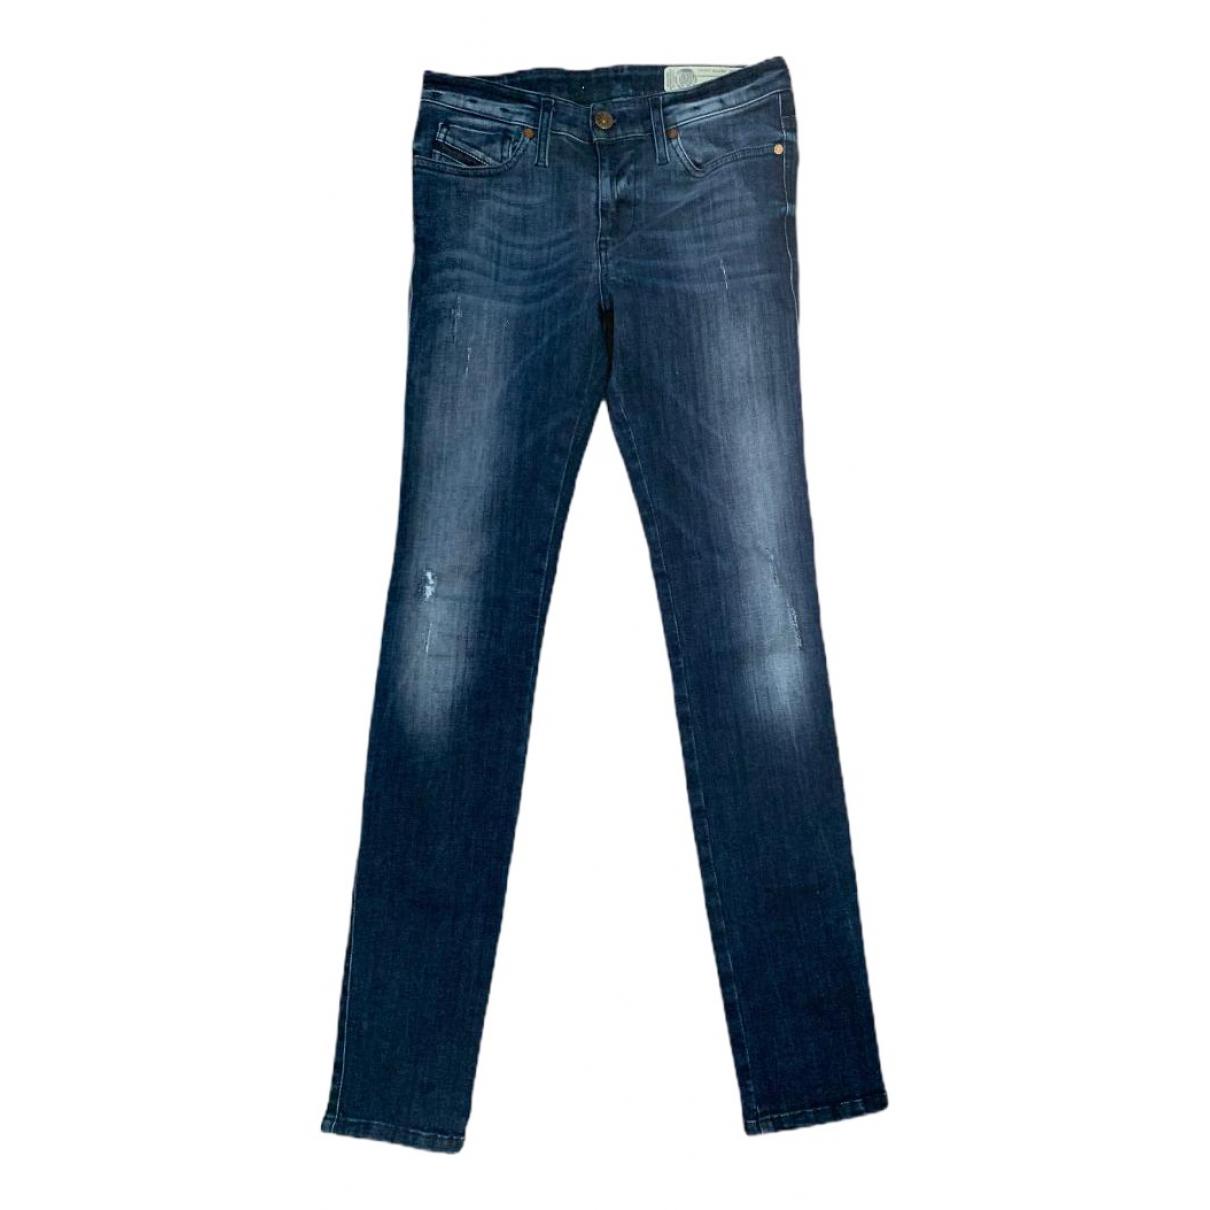 Diesel \N Blue Denim - Jeans Jeans for Women 25 US